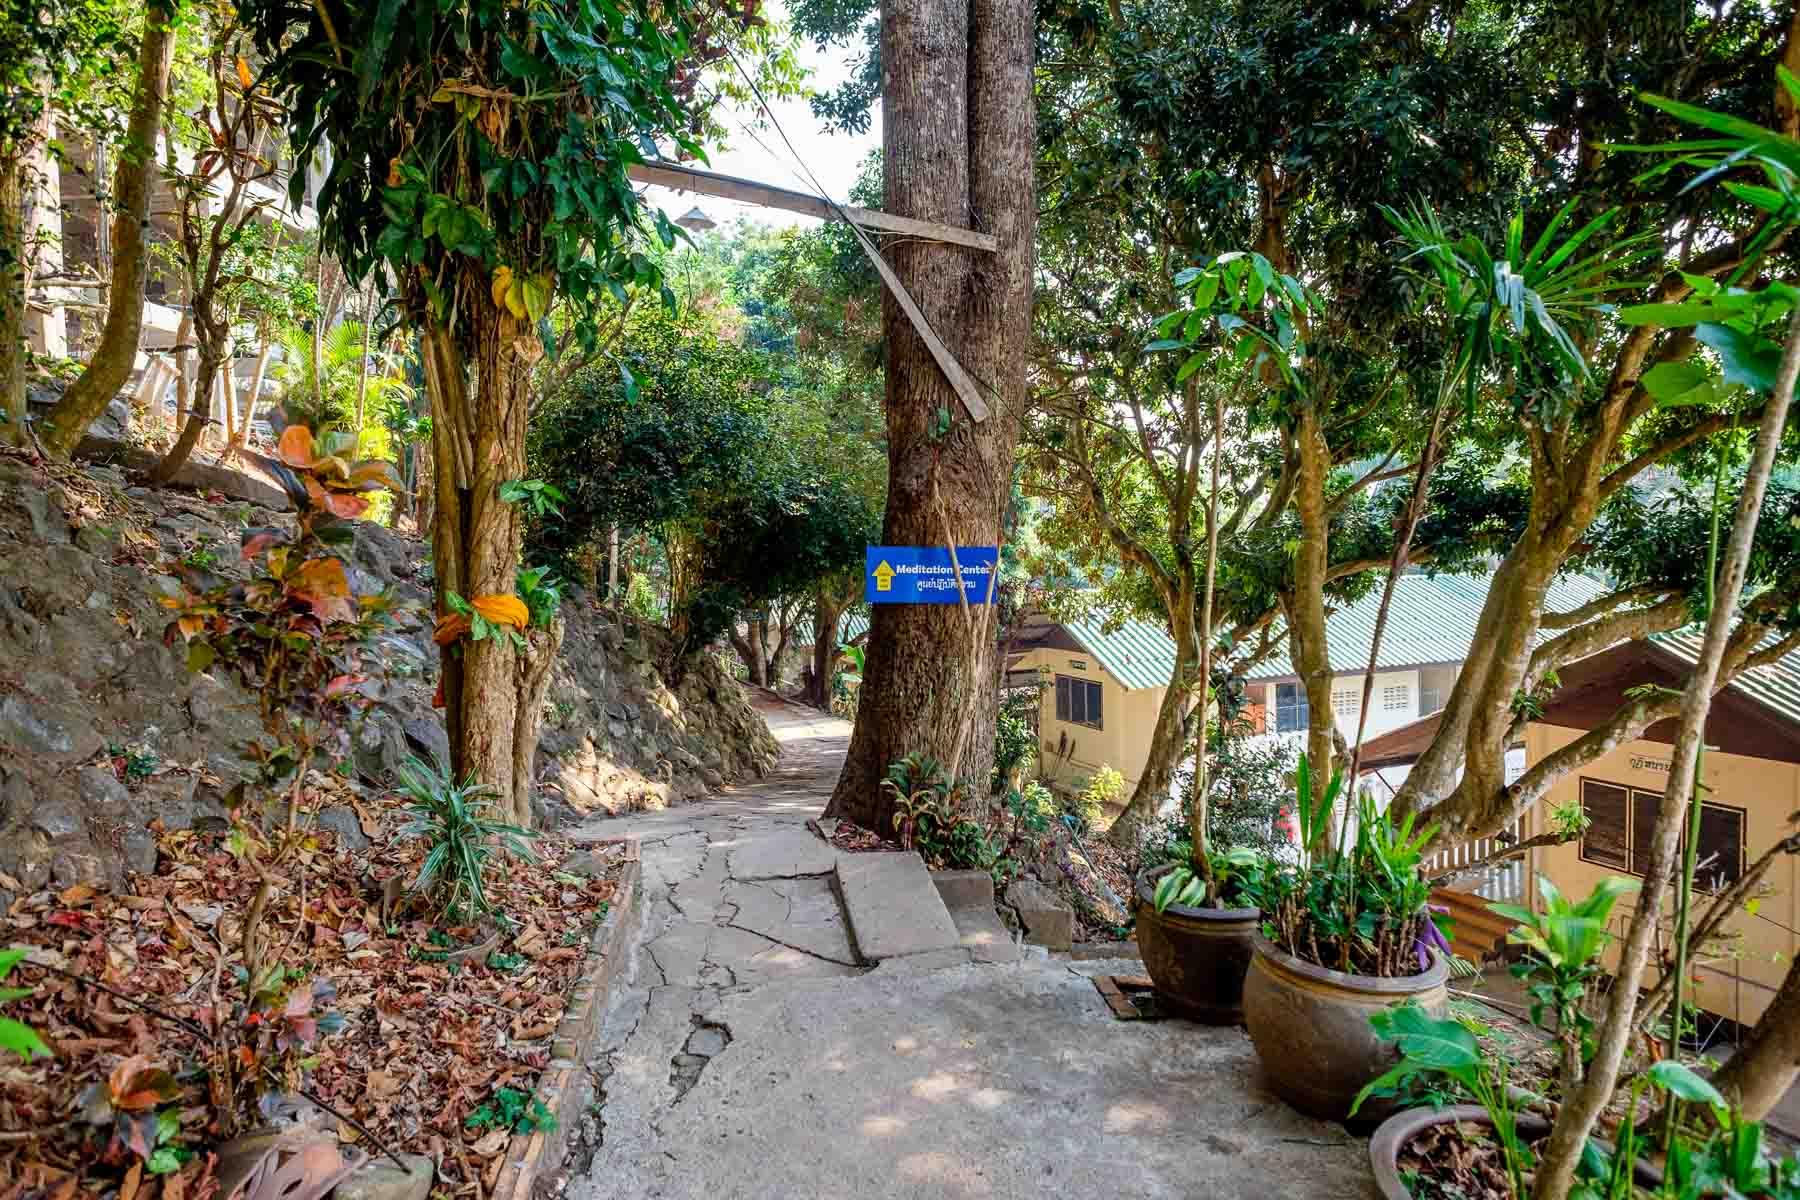 Path to meditation center